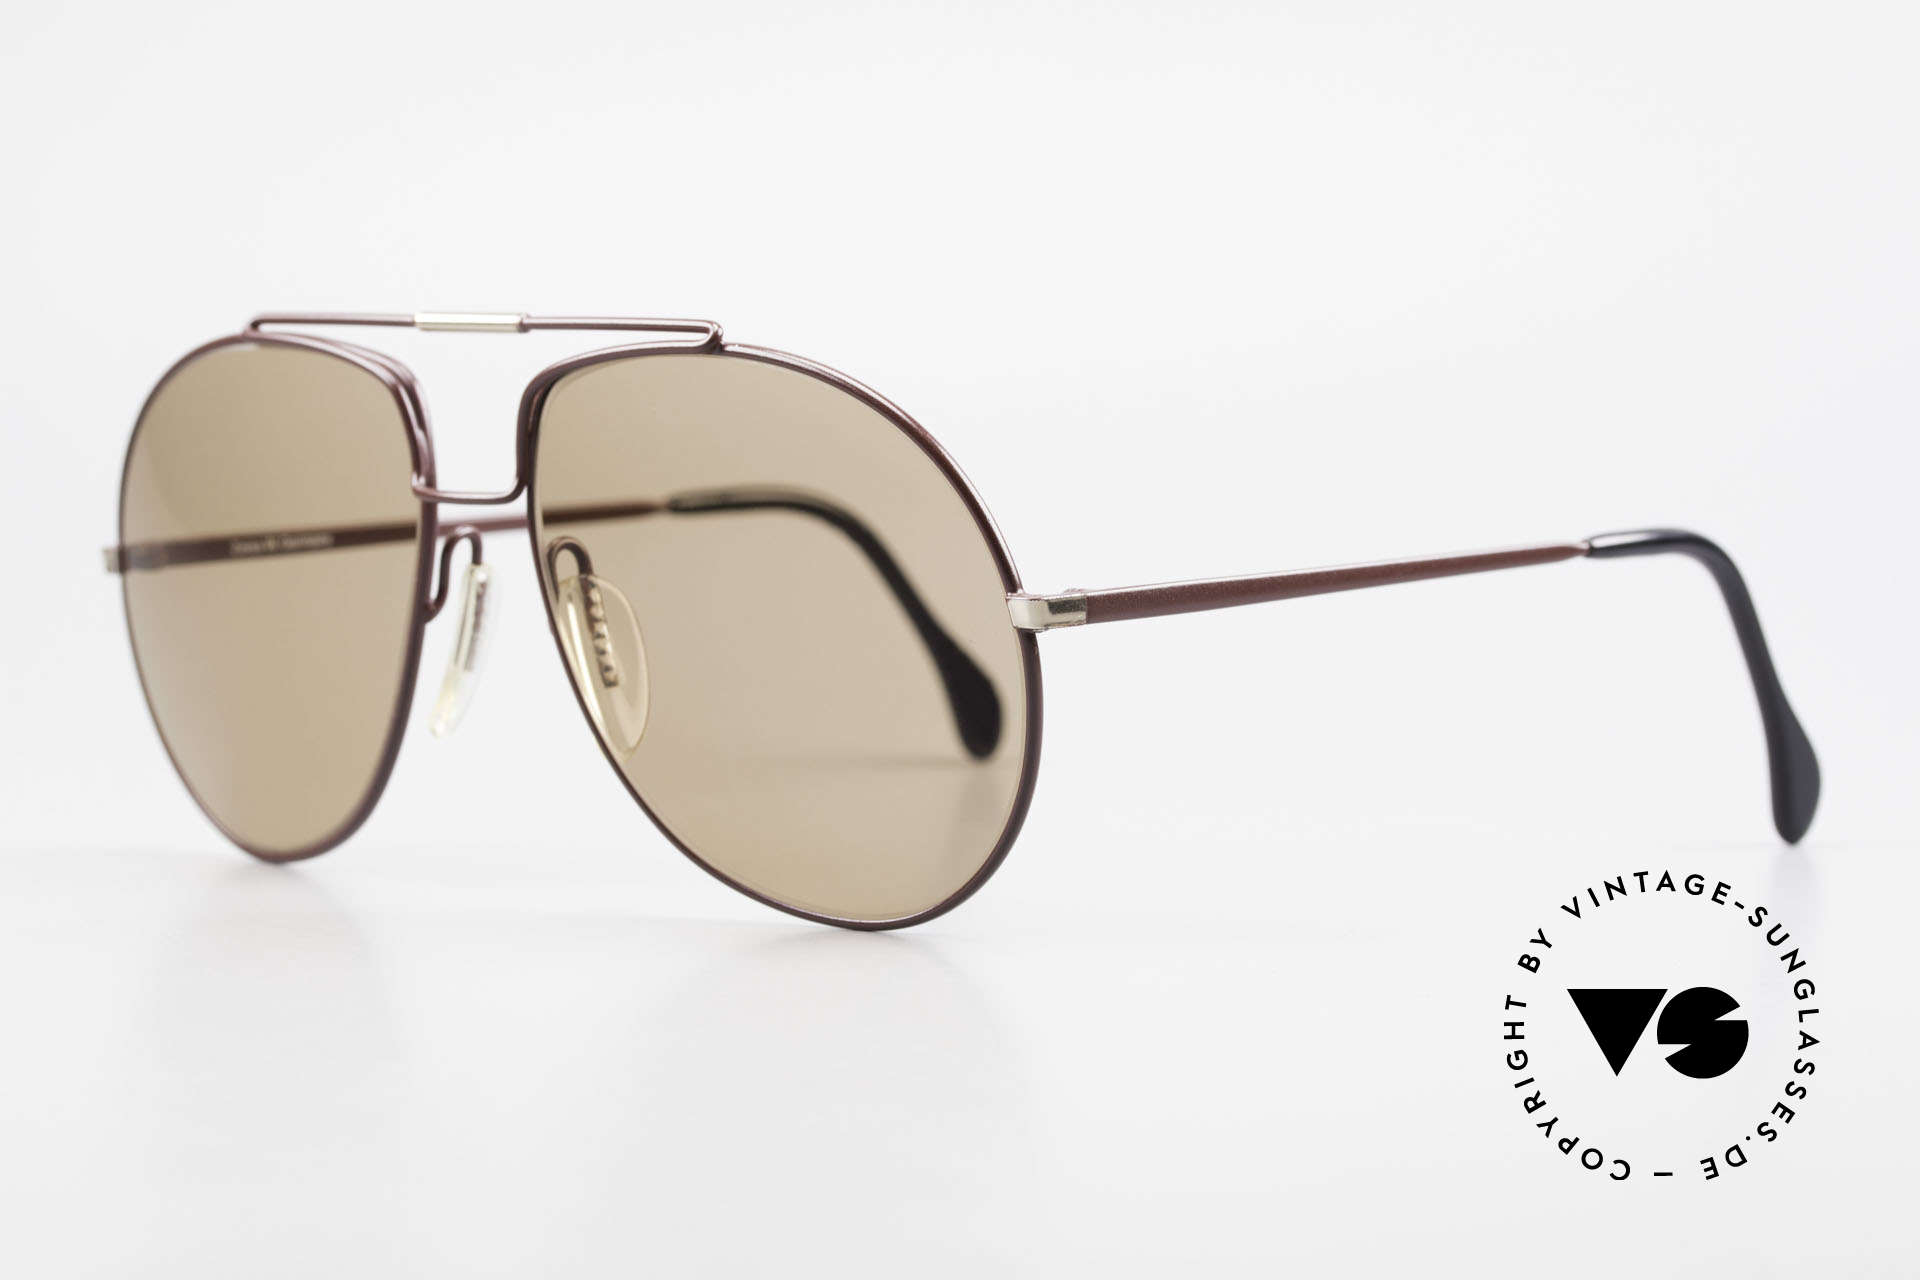 Zeiss 9369 80's Frame With Mineral Lenses, premium UMBRAL mineral lenses (100% UV protection), Made for Men